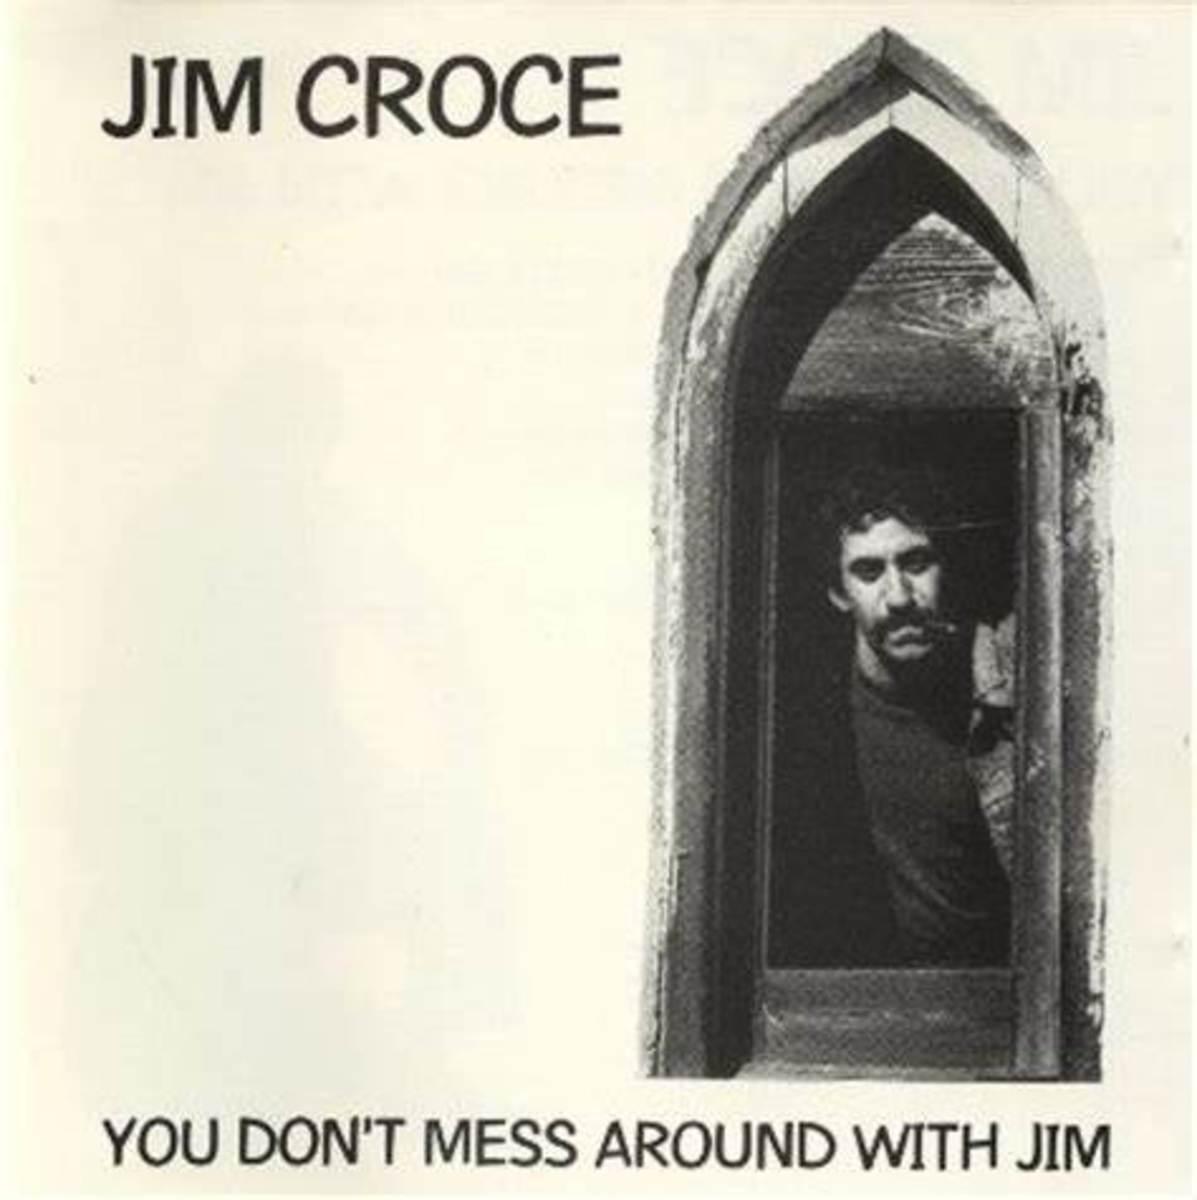 Jim Croce album